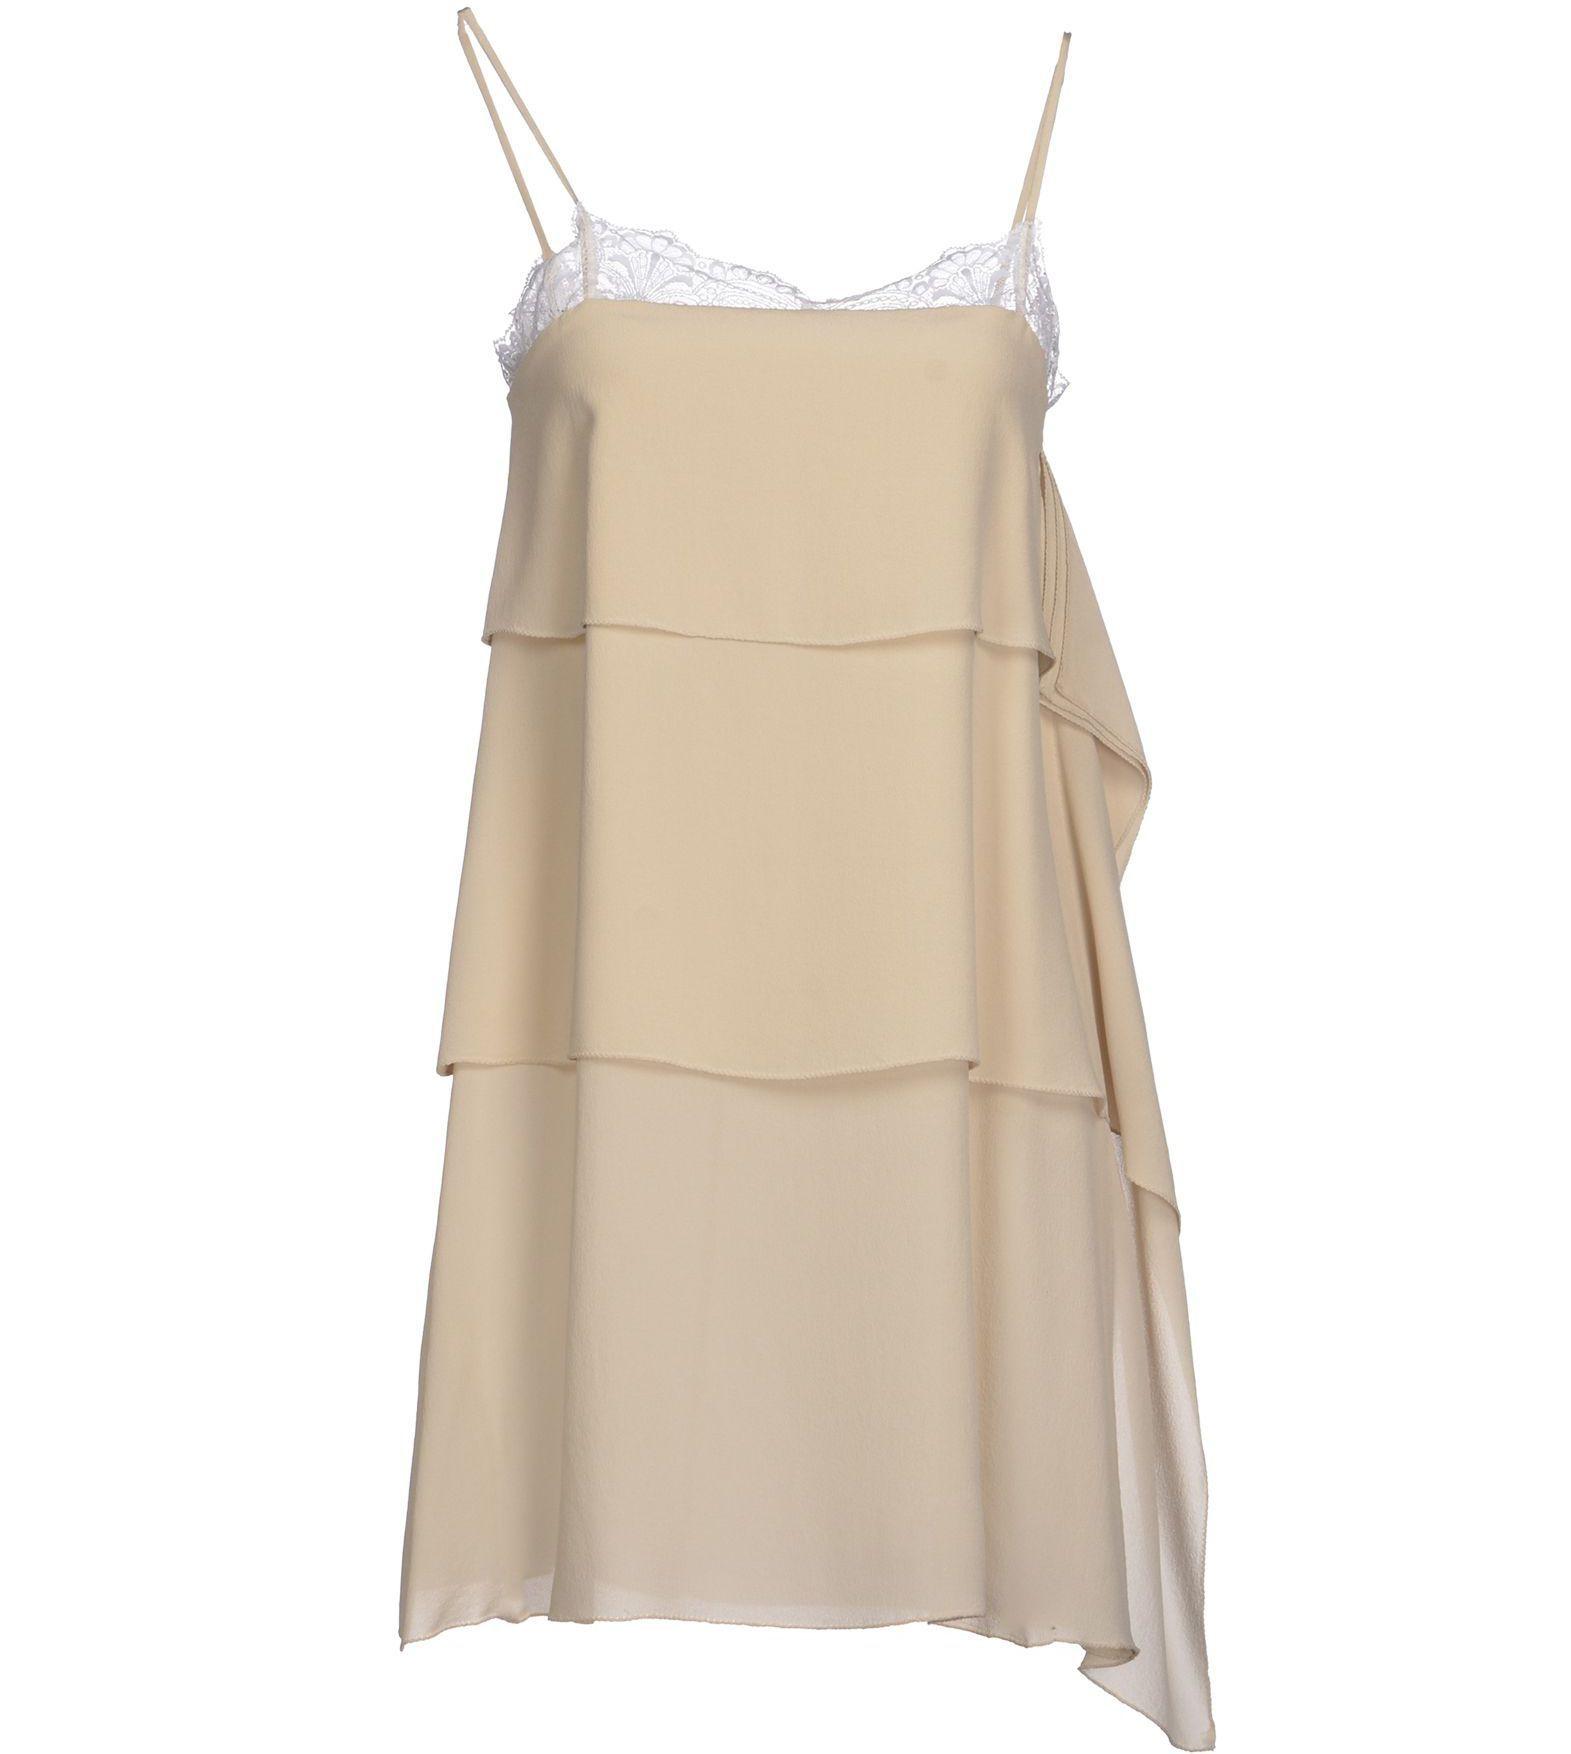 SUOLI ΦΟΡΕΜΑΤΑ Κοντό φόρεμα  #sales #style #fashion